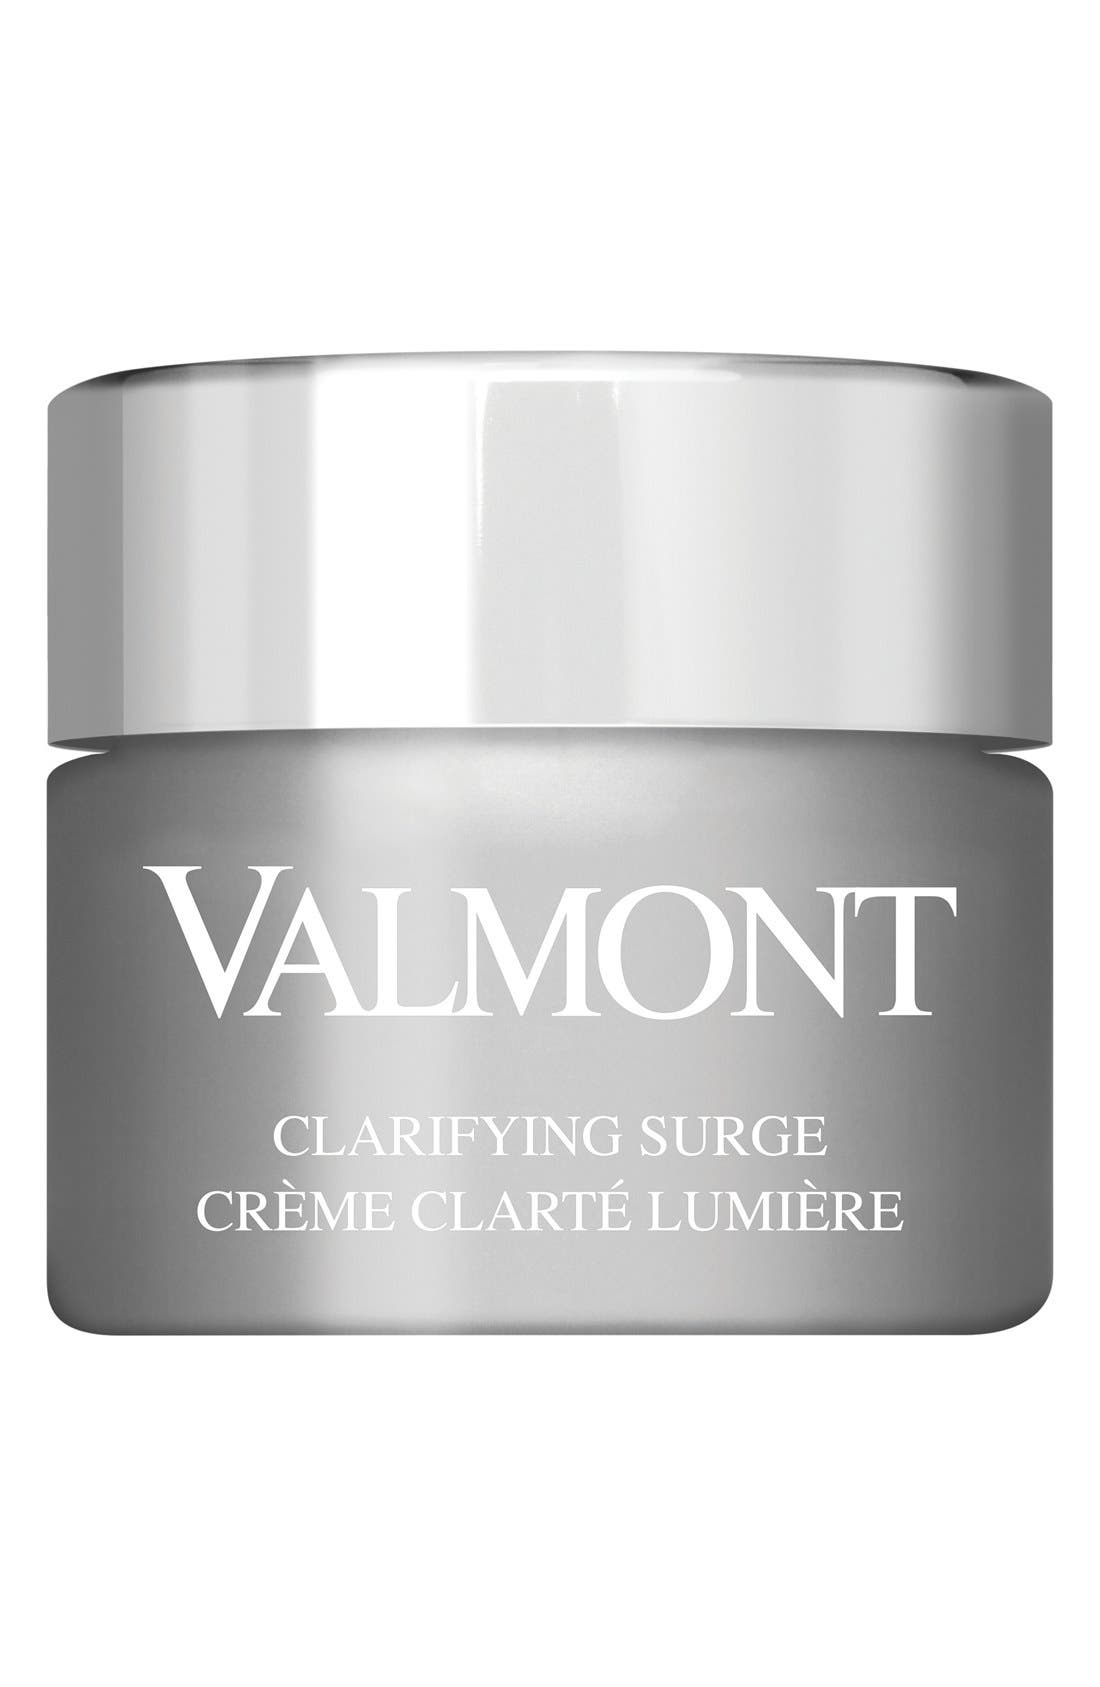 Valmont Clarifying Surge Cream